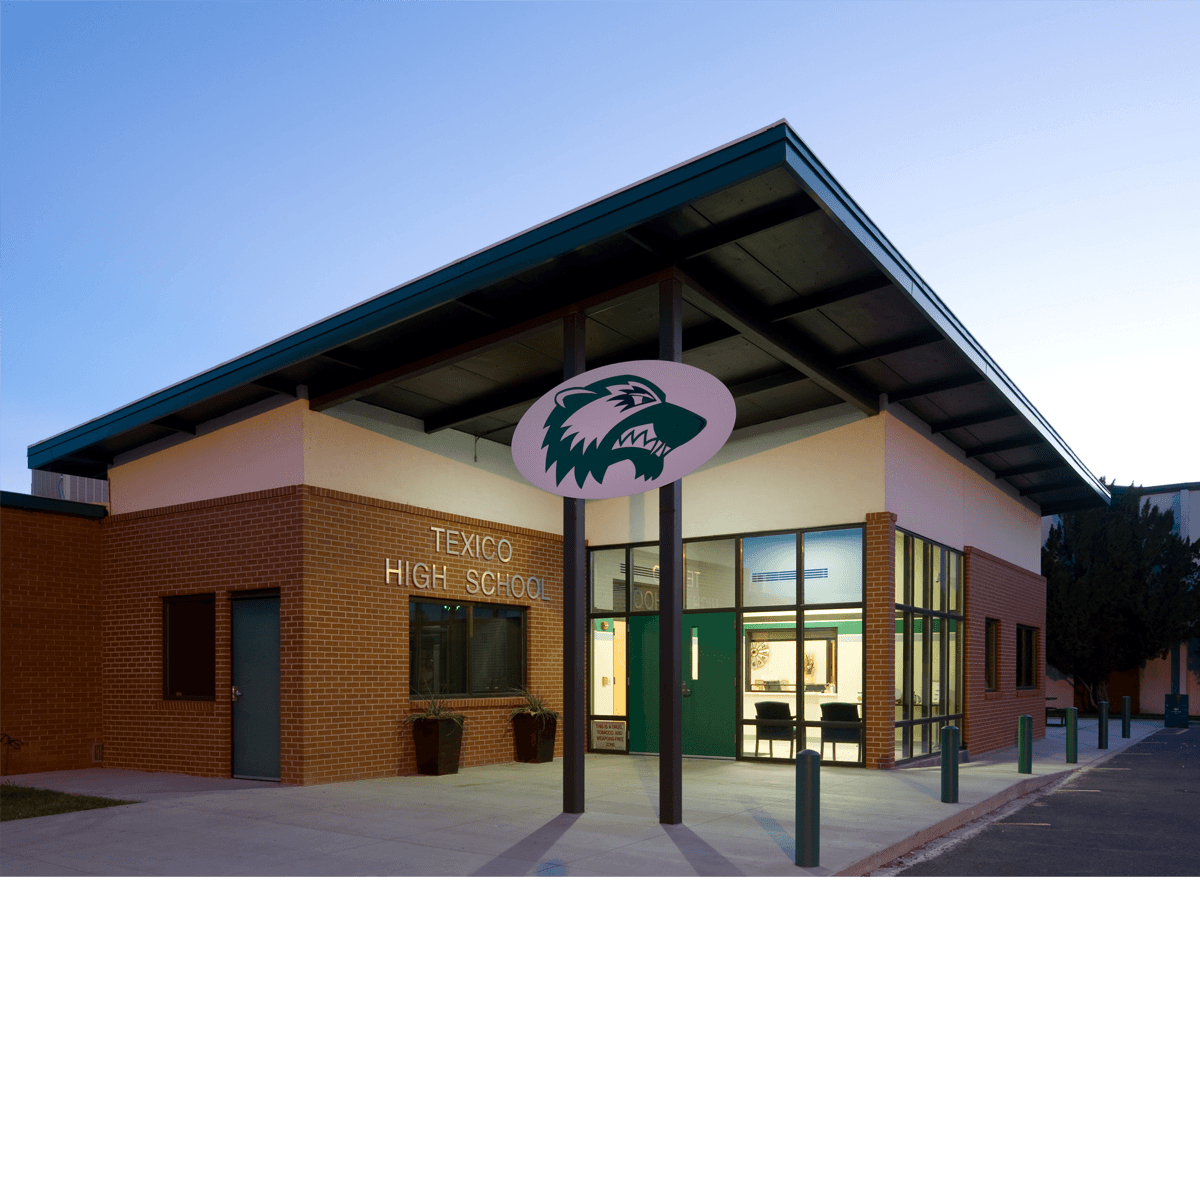 Texico High School